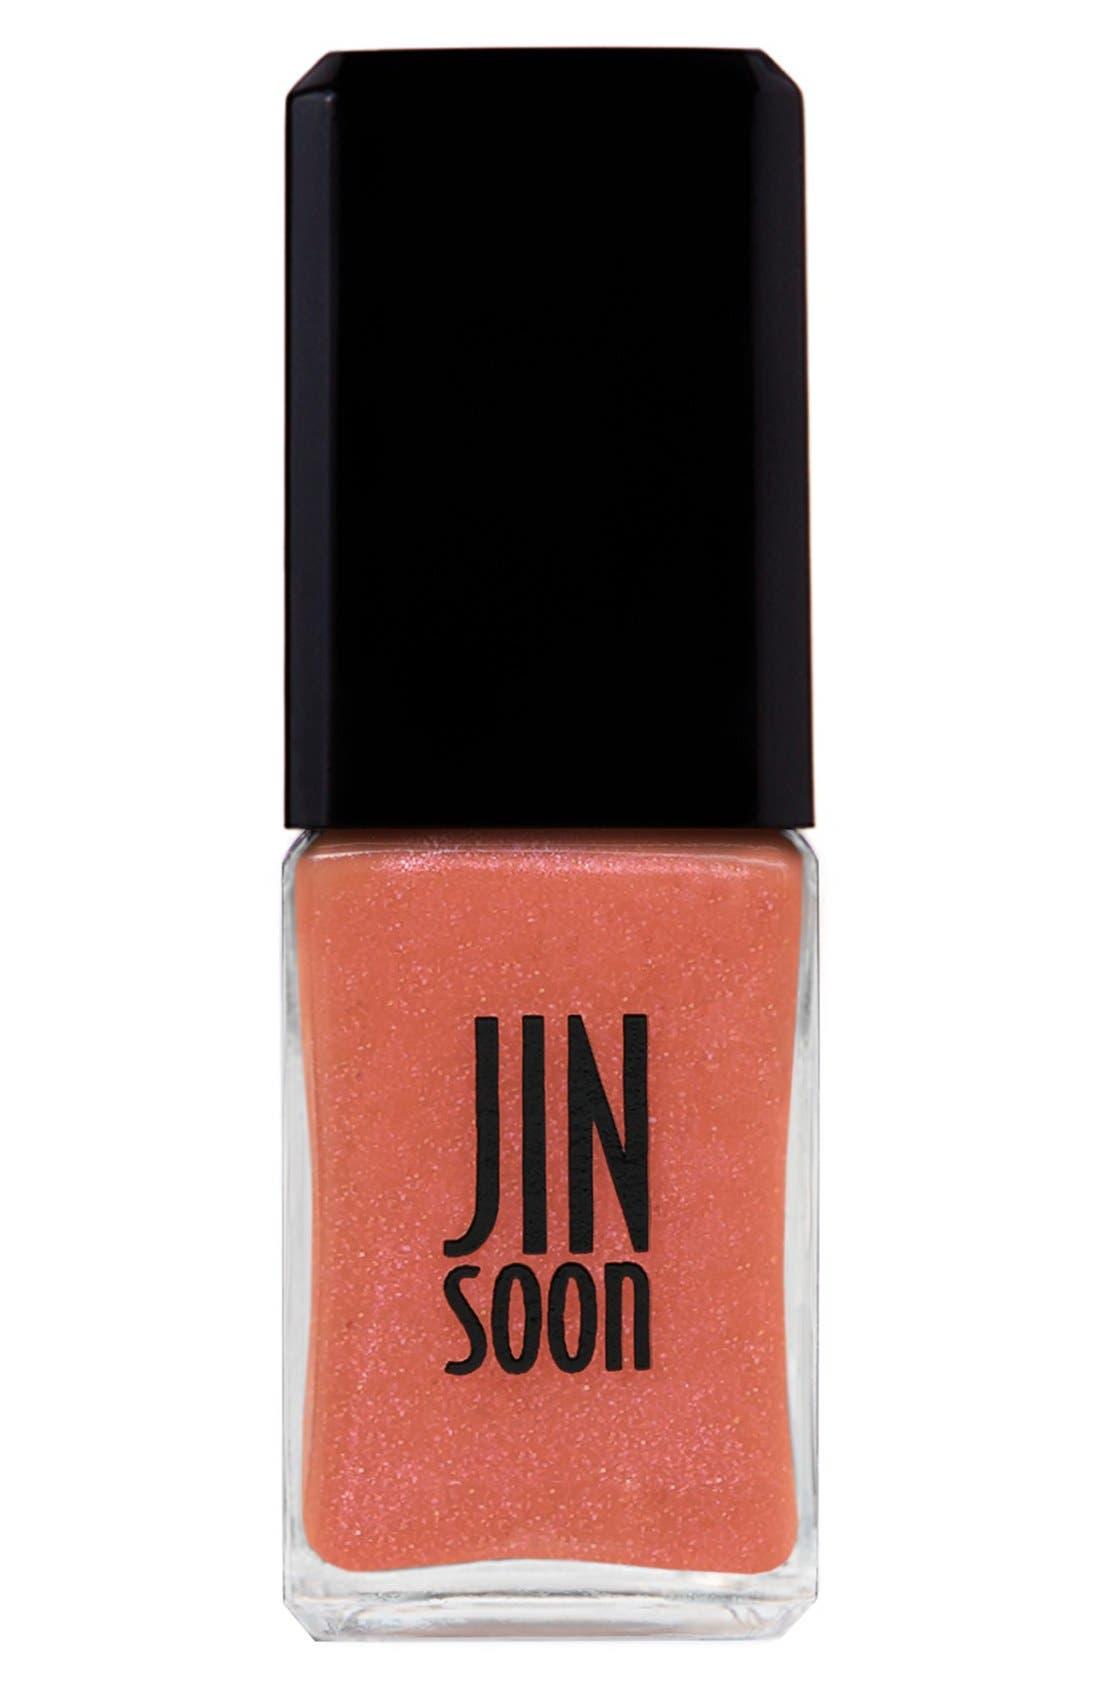 JINsoon 'Pastiche' Nail Lacquer